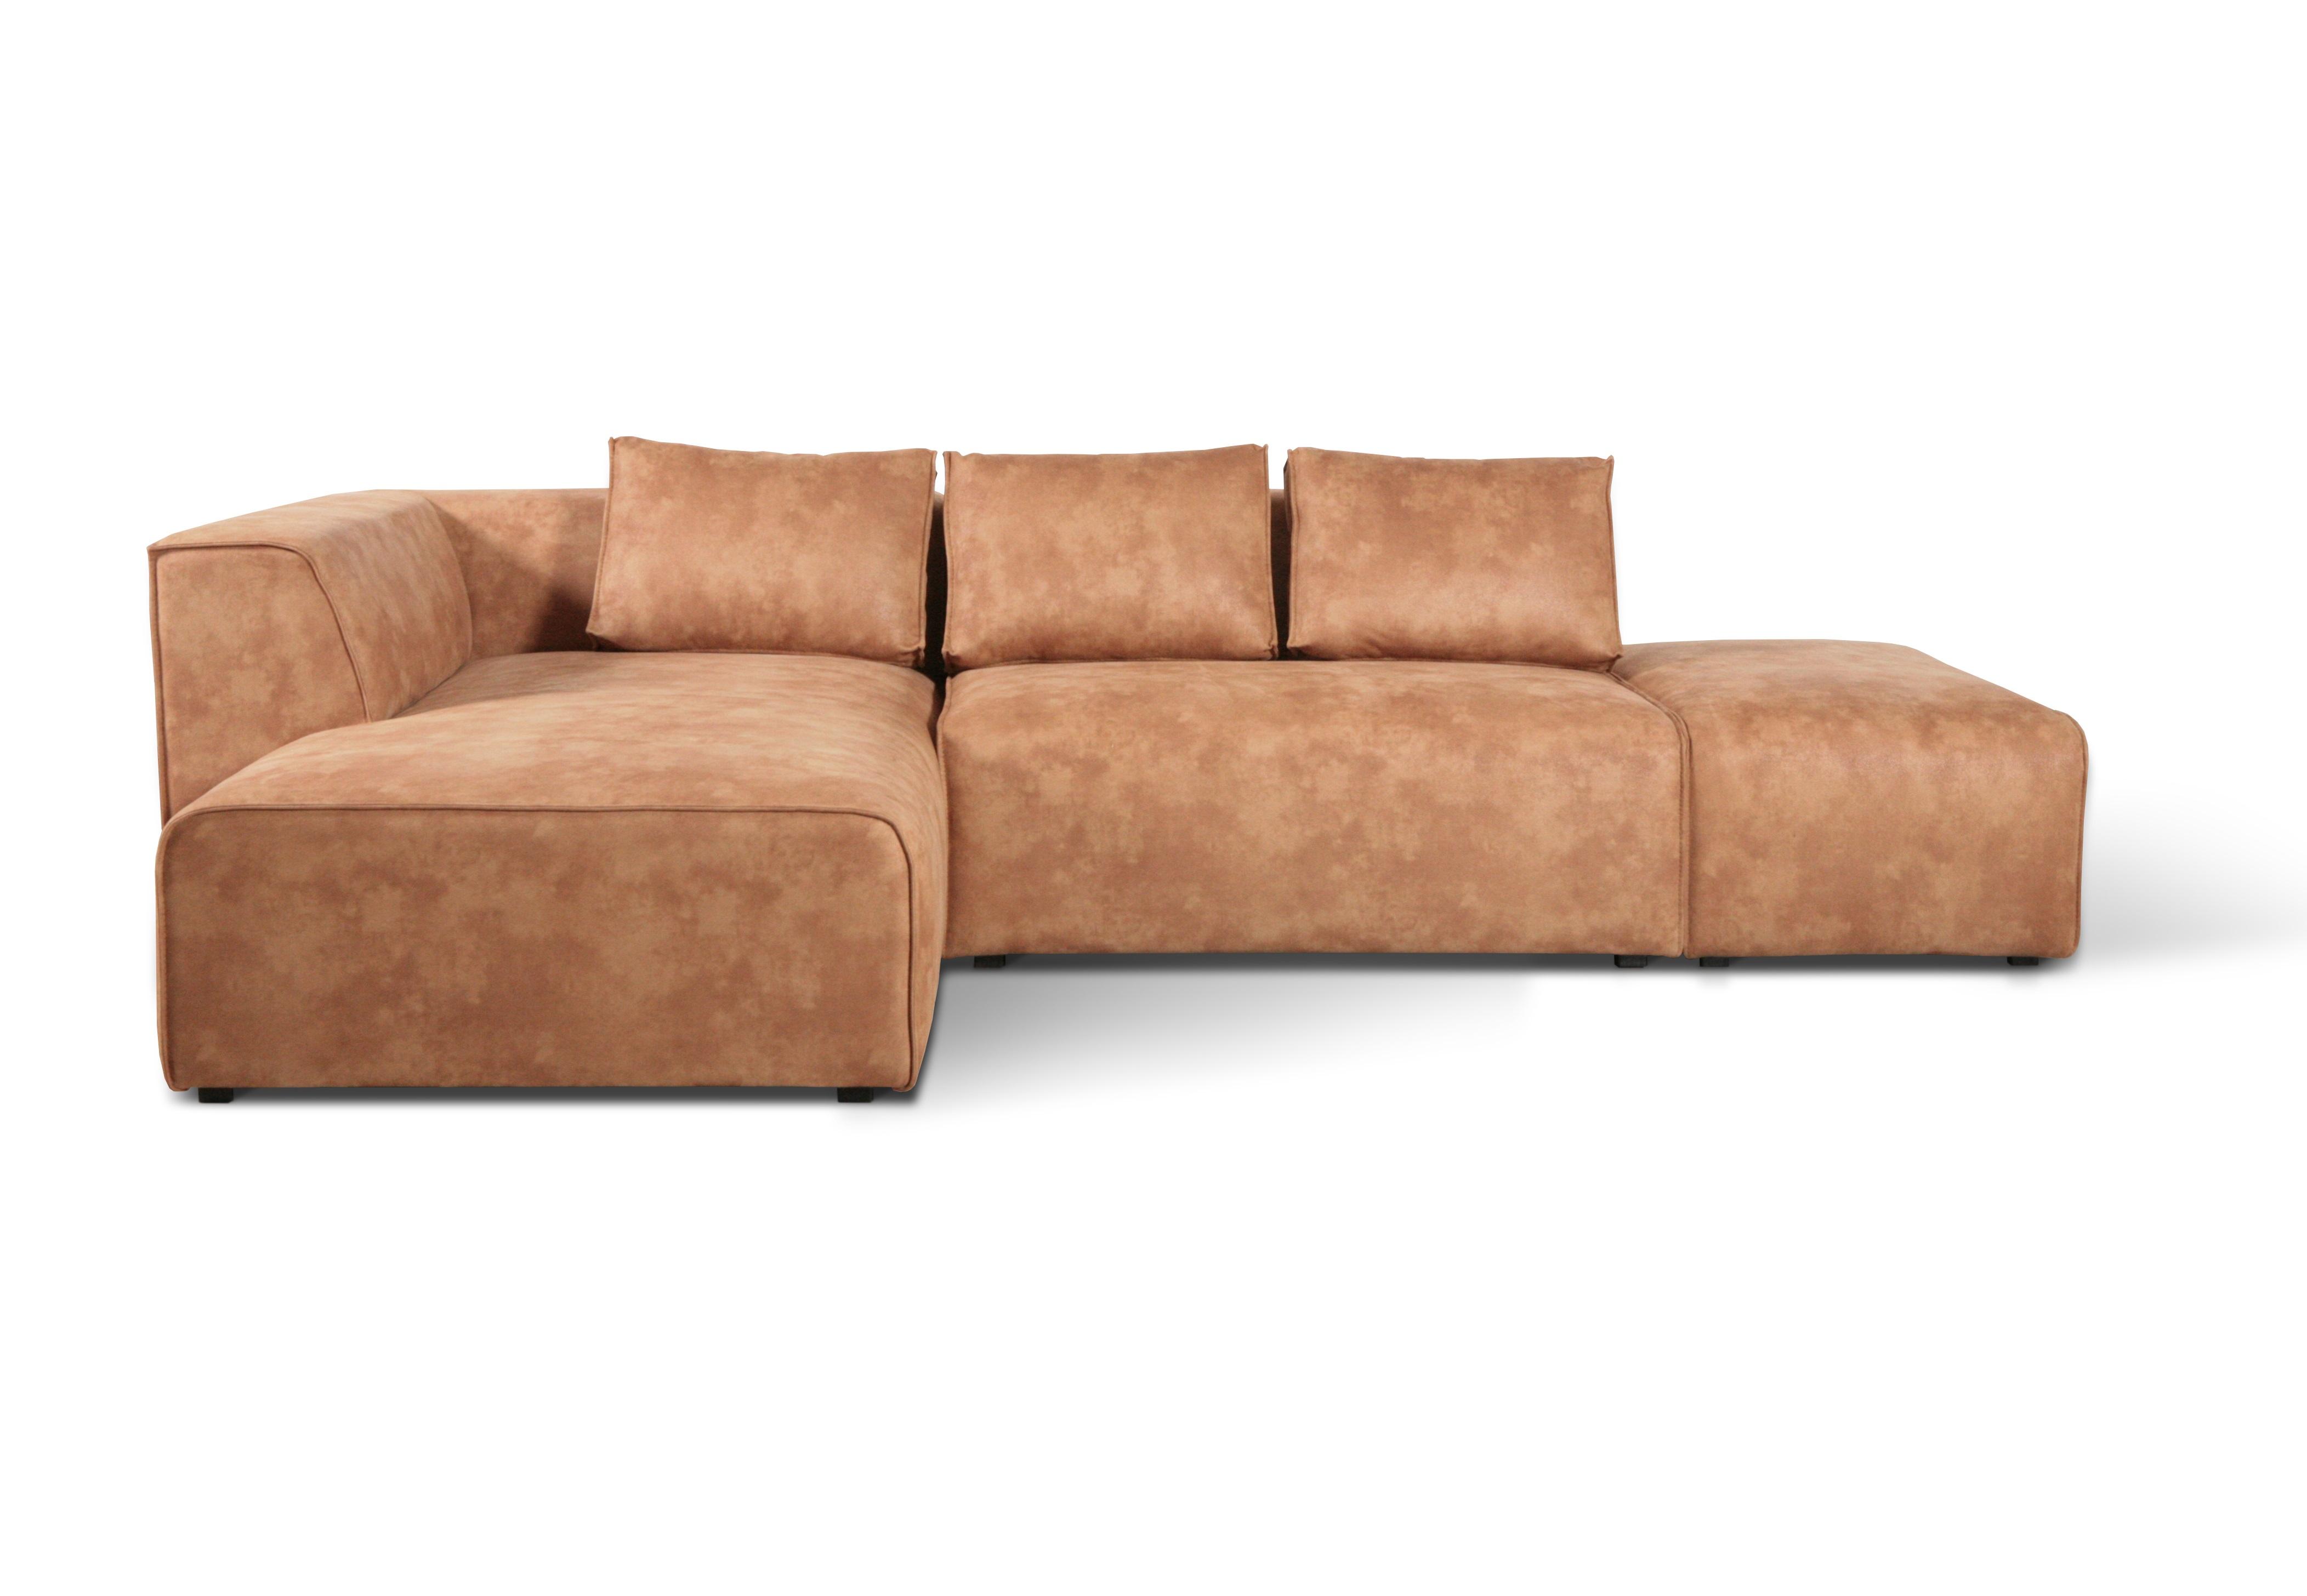 Kare диван угловой industrial loft оранжевый 143332/2